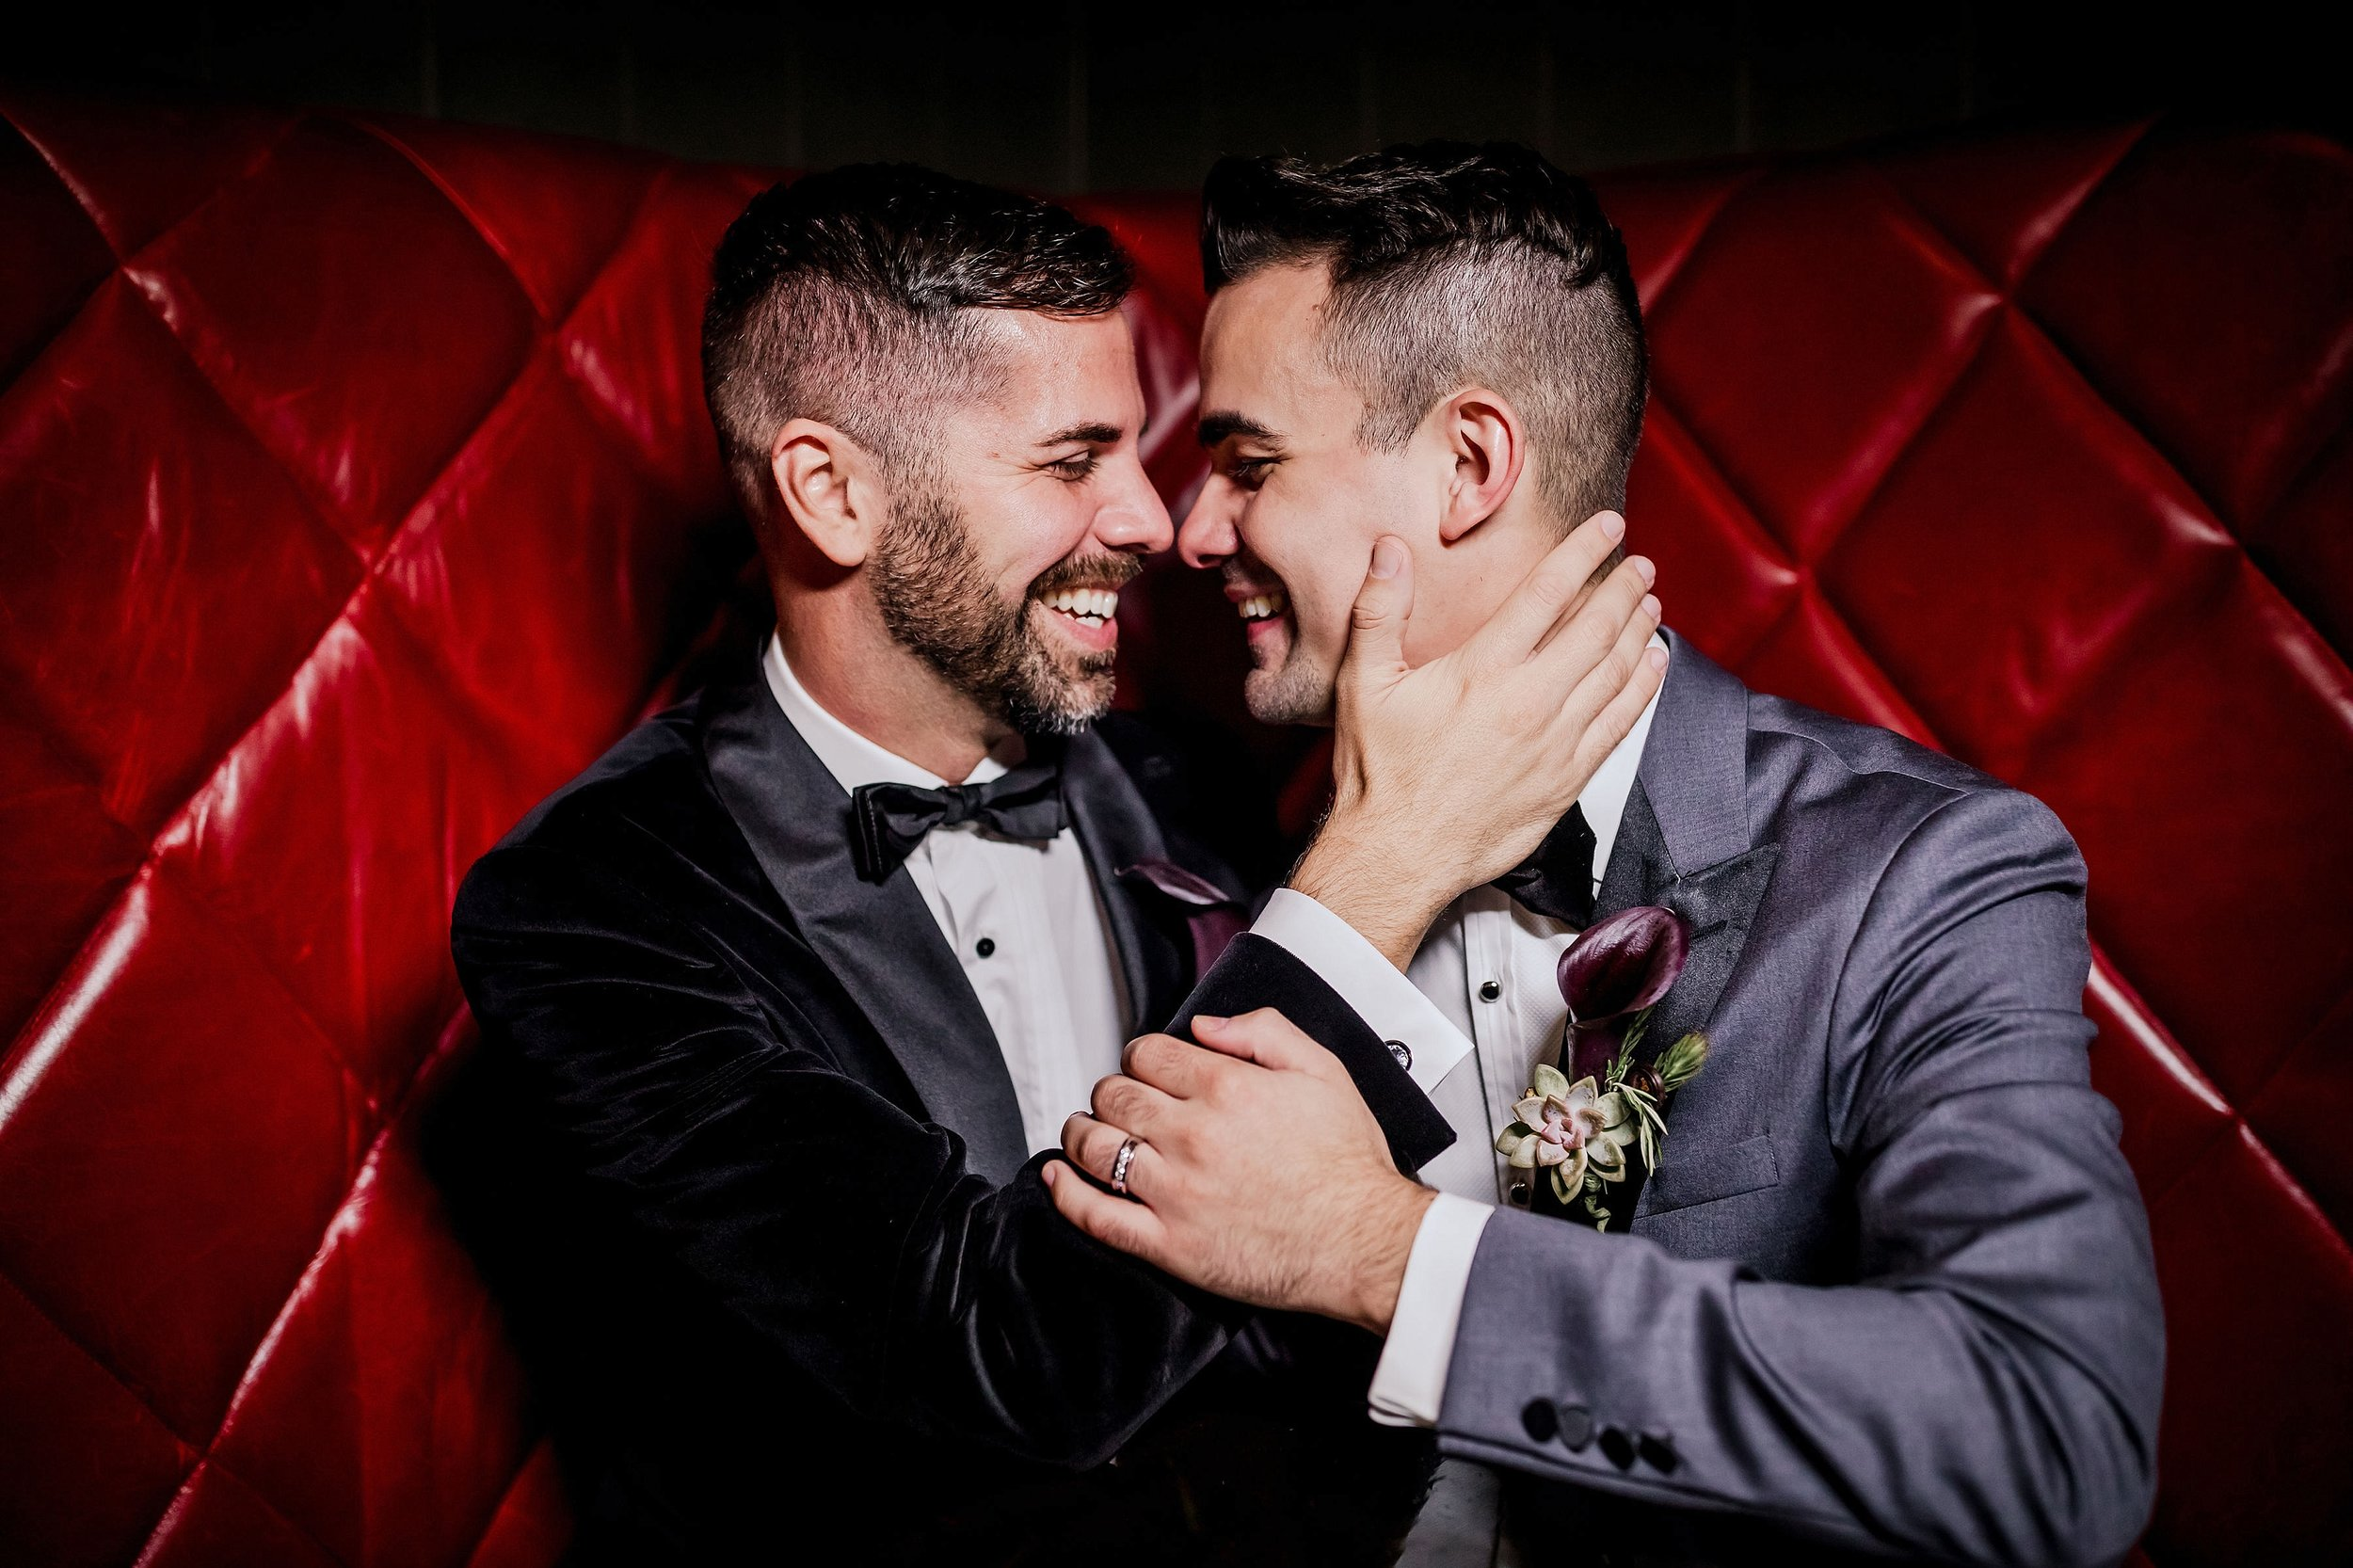 New-York-City-Wedding-Photographer_0003.jpg